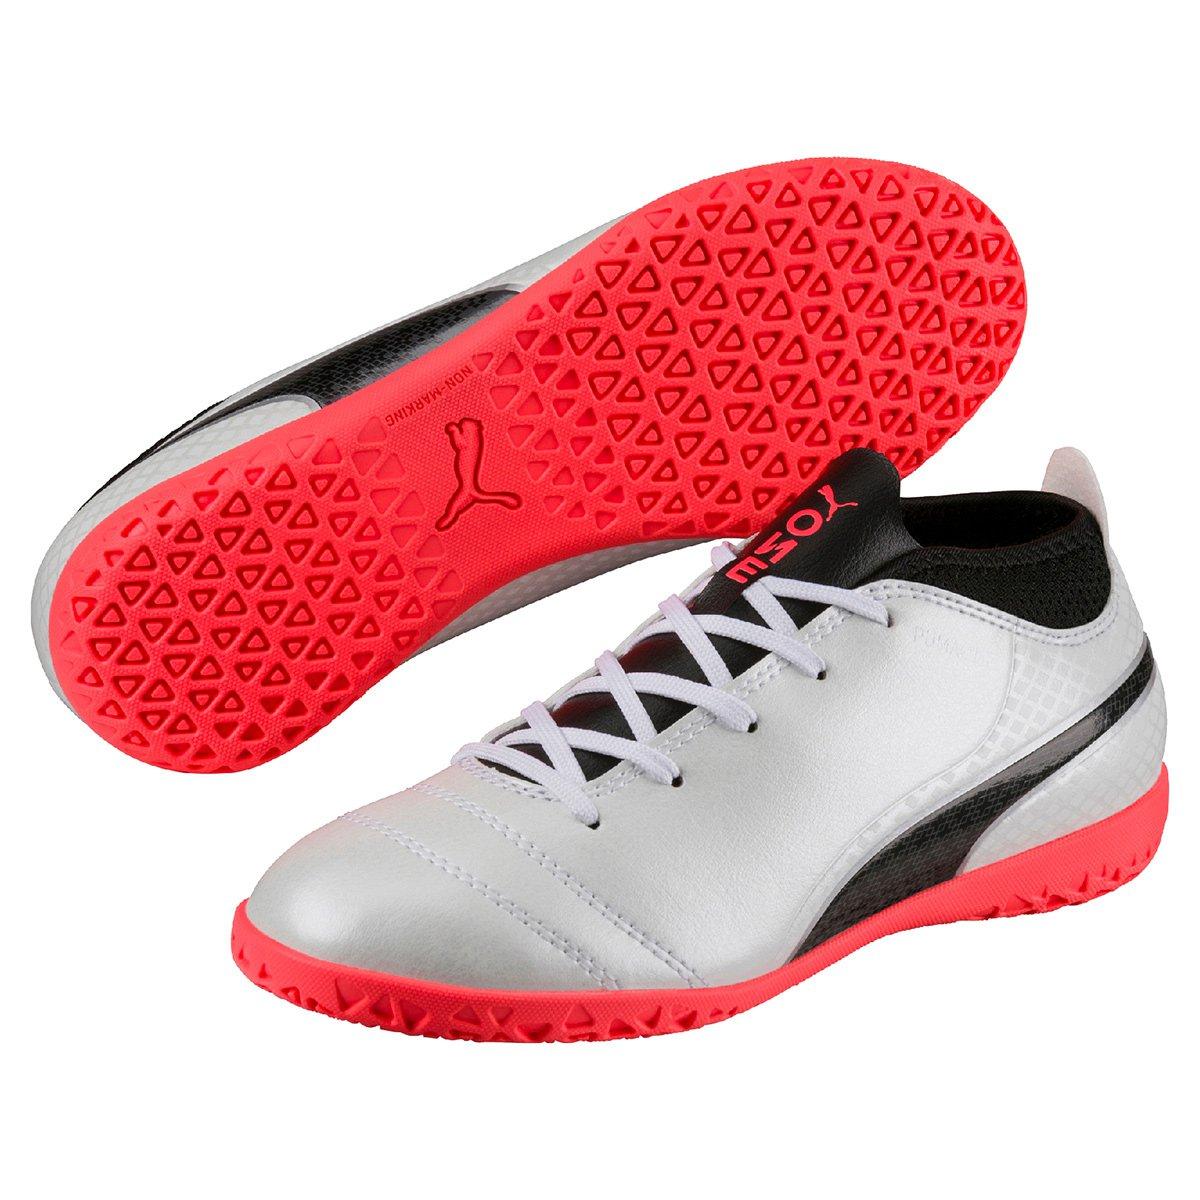 e5cb04e2b58 Chuteira Futsal Infantil Puma One 17.4 IT - Compre Agora